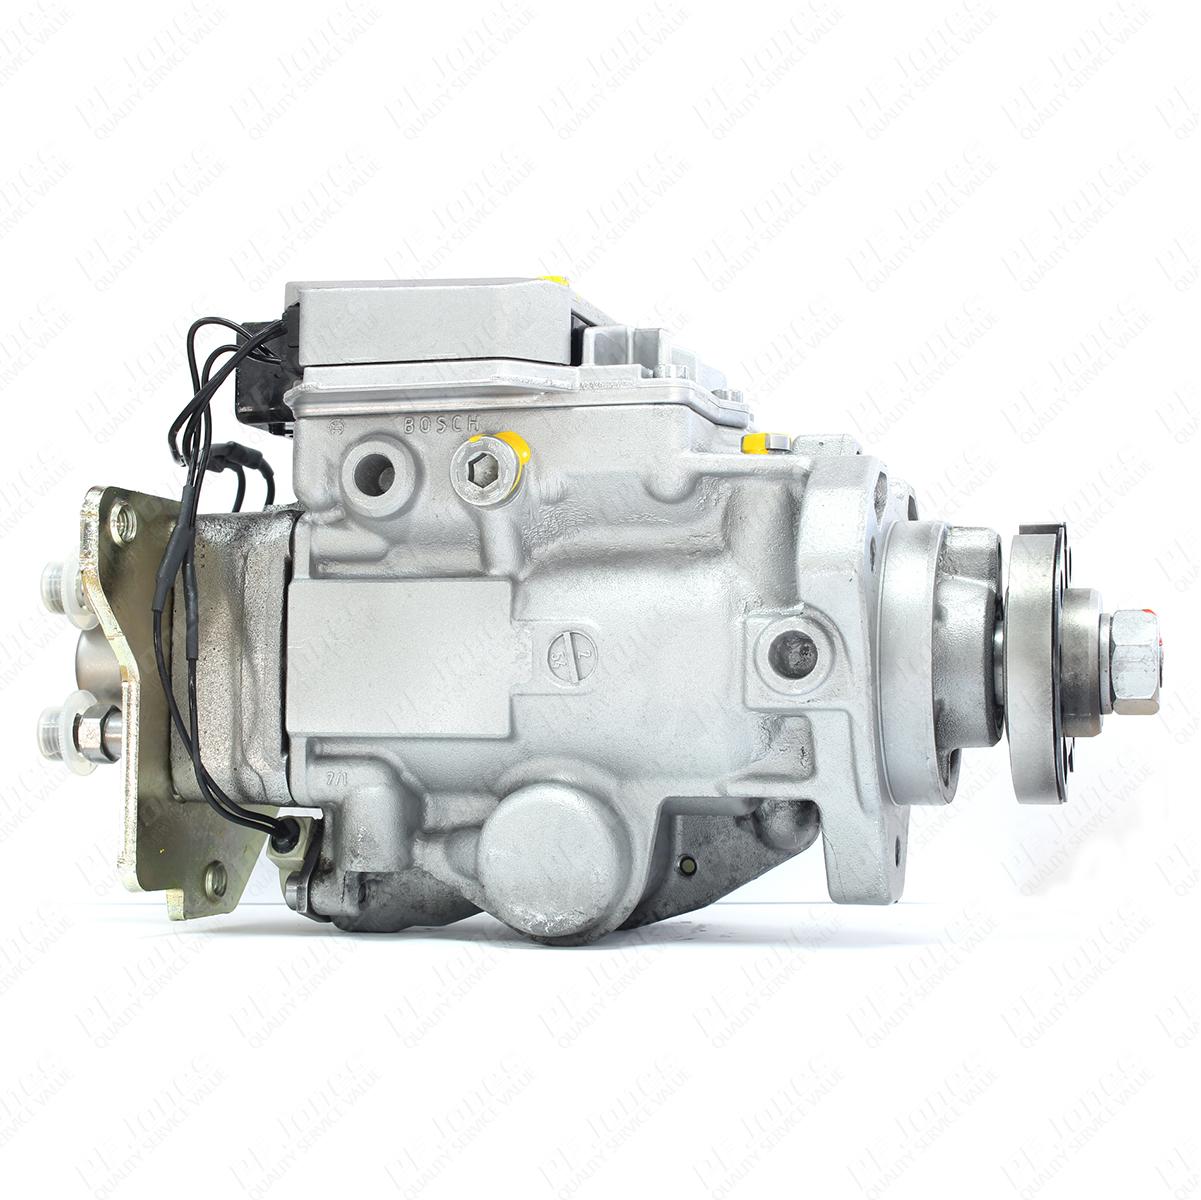 hight resolution of ford focus 1 8 tddi 2000 2005 reconditioned bosch diesel fuel pump 0470004008